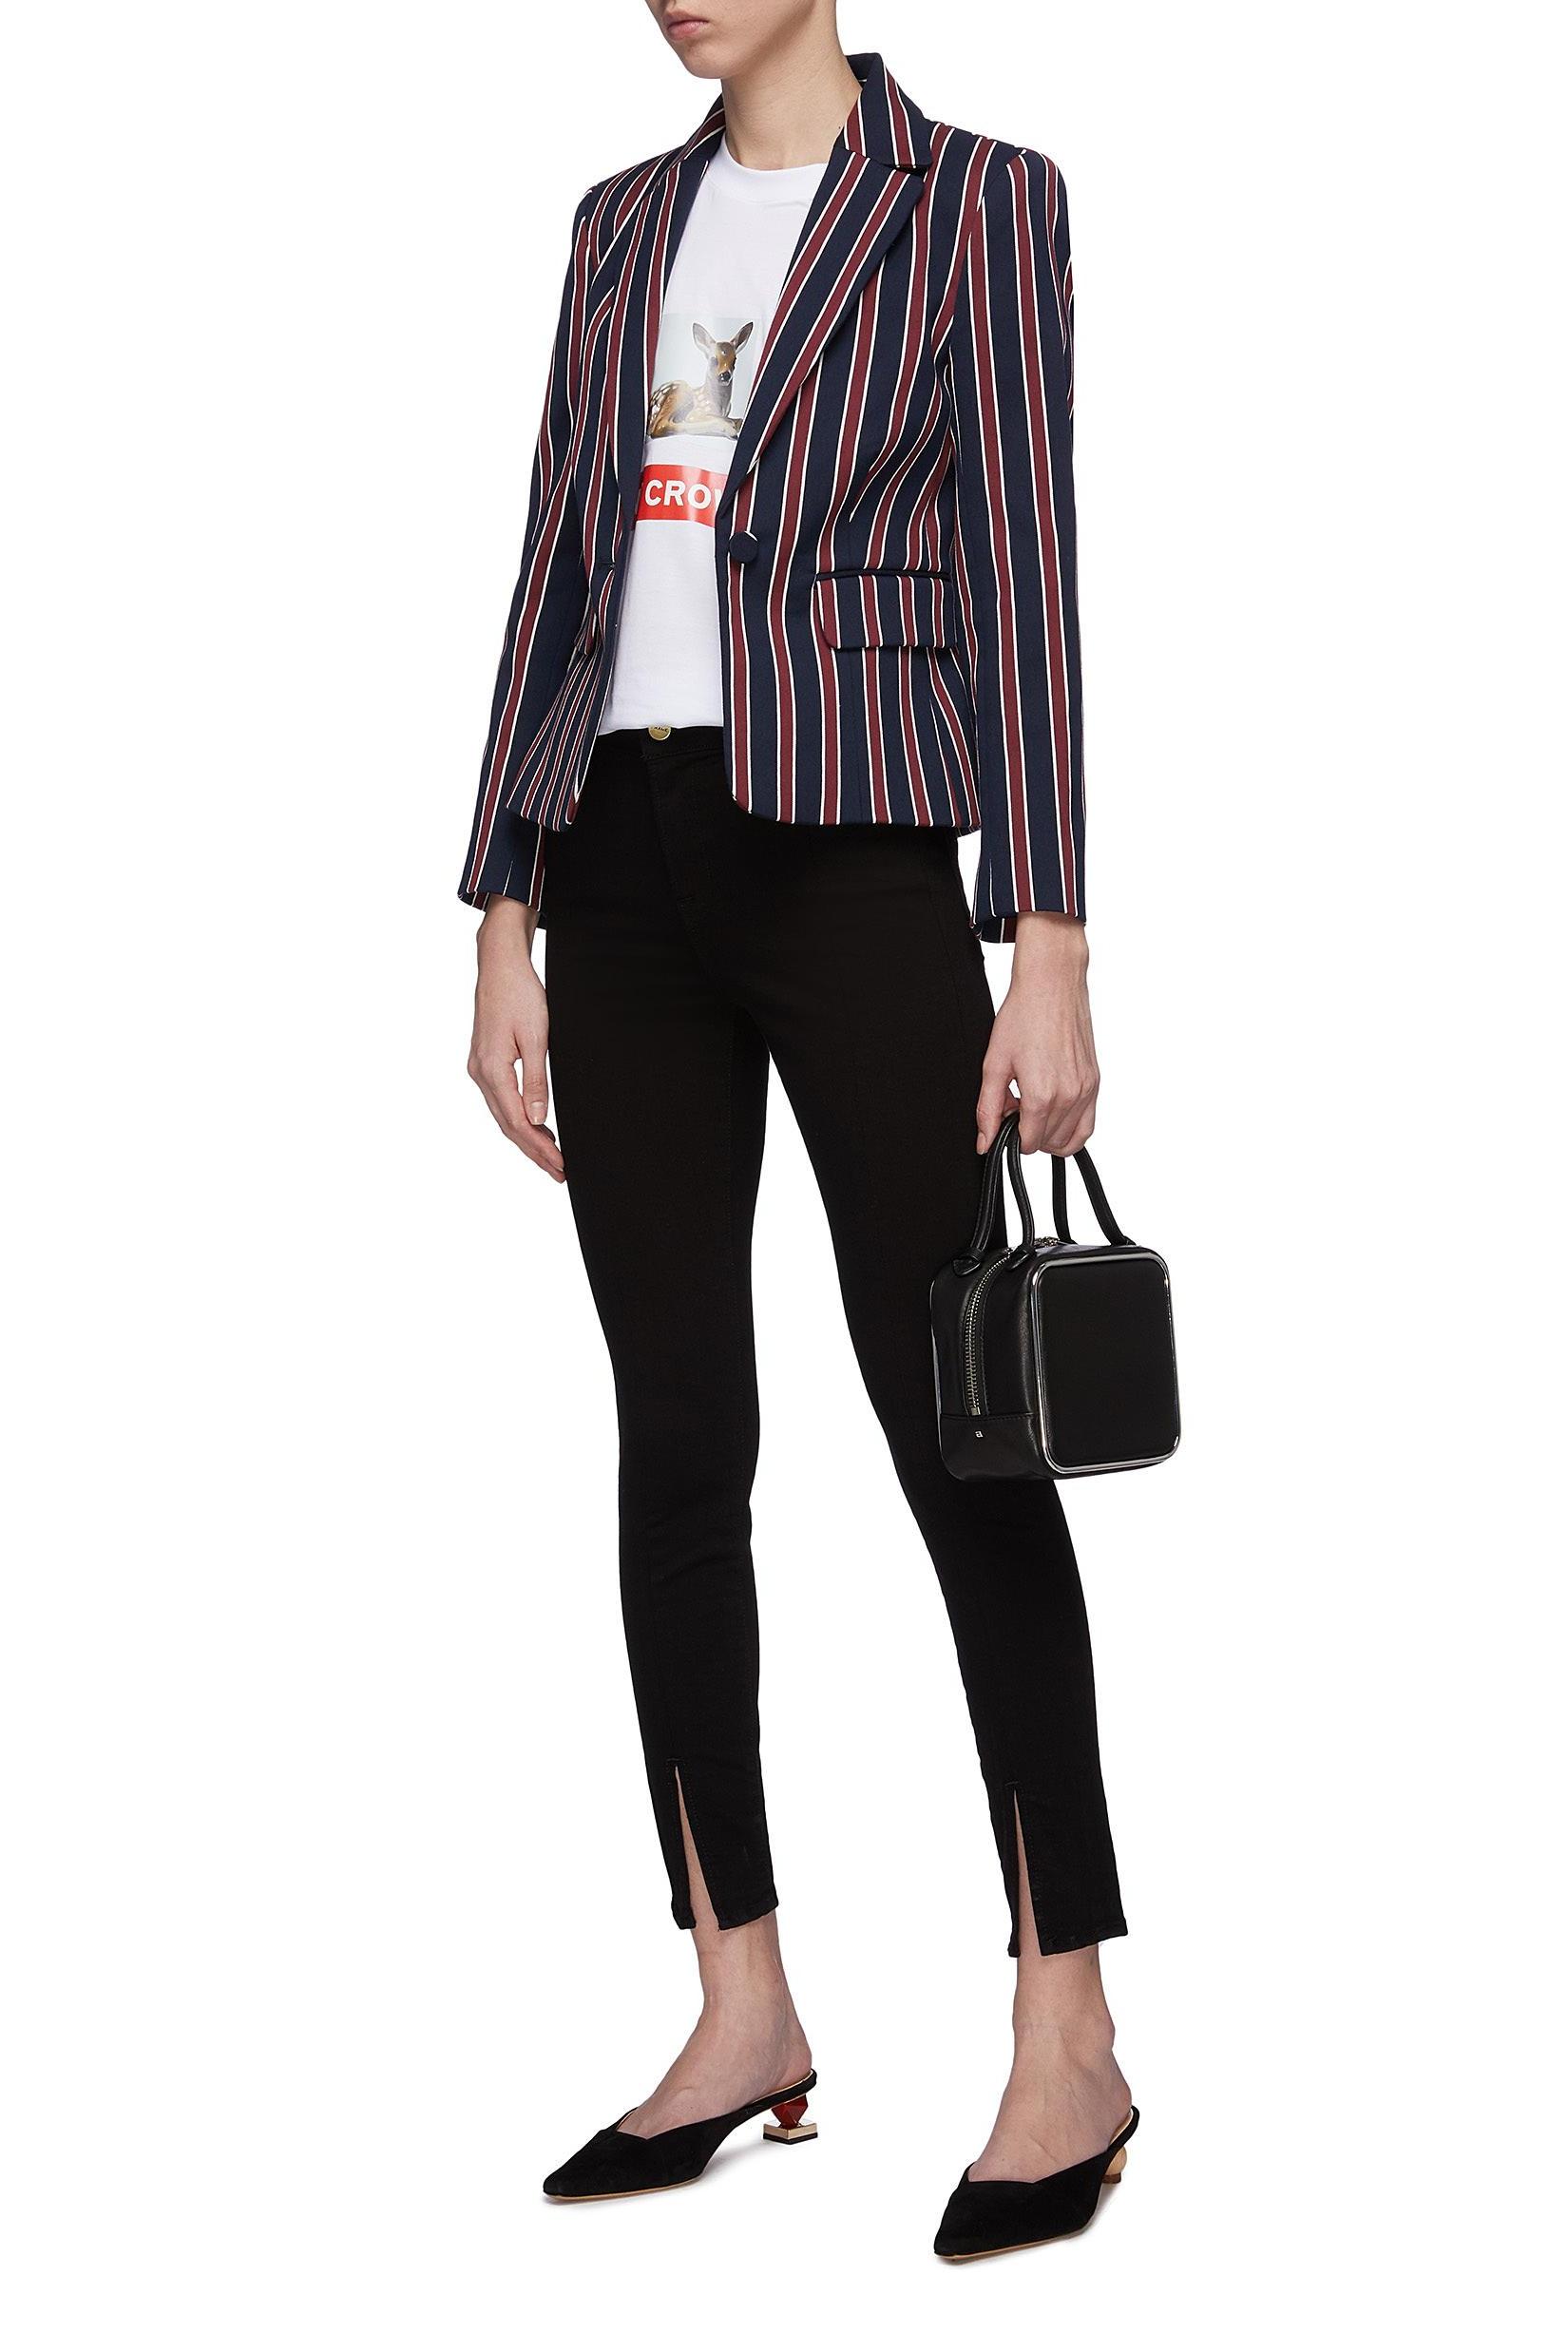 △ Frame Denim 'Le High Skinny' Split Cuff Jeans  US$210 (~HK$1,647)